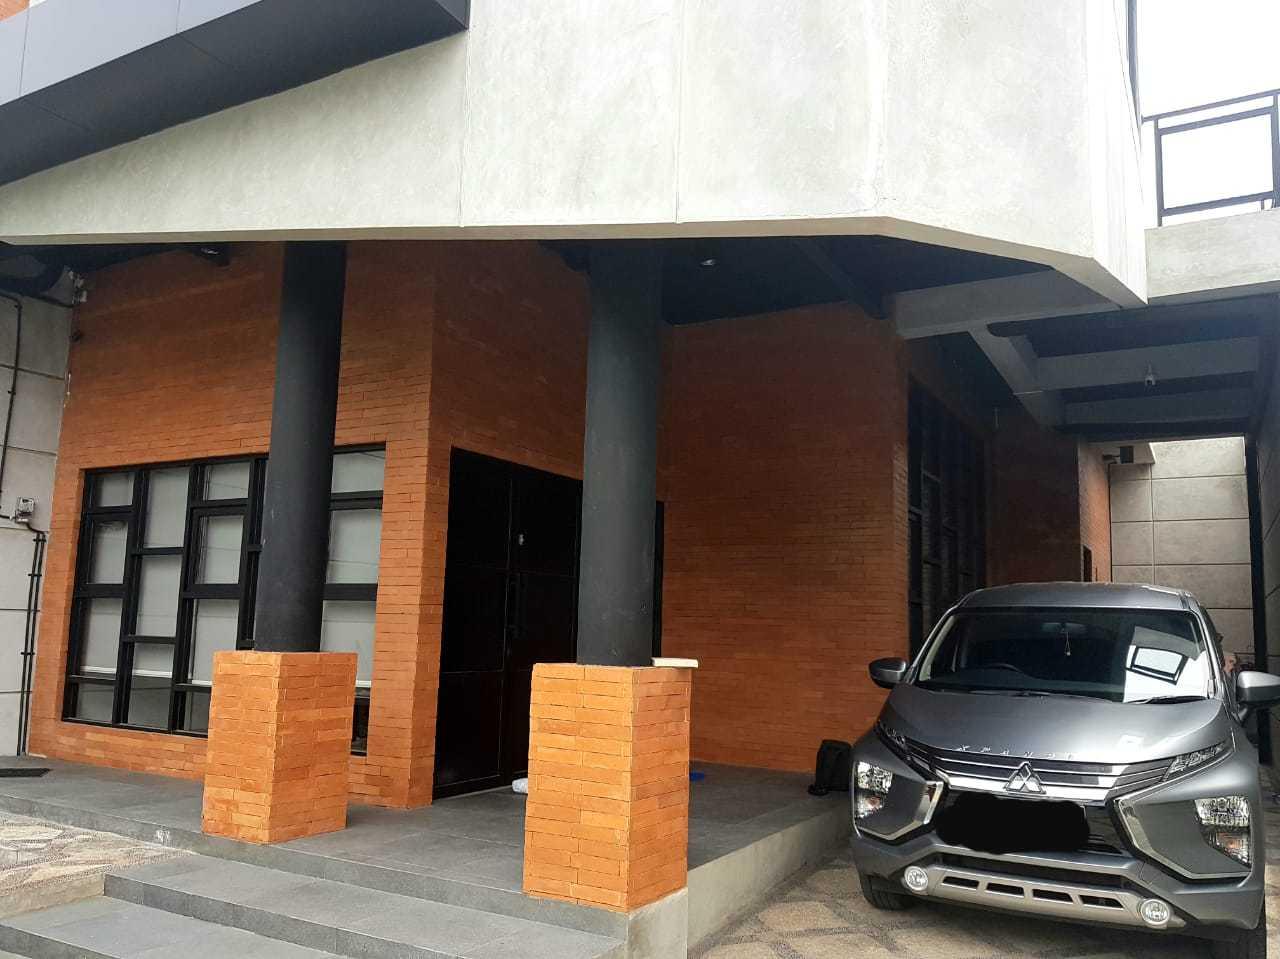 Indoneosian Architect Sudut Industrialis Tlogosari Kulon, Pedurungan, Semarang City, Central Java, Indonesia Tlogosari Kulon, Pedurungan, Semarang City, Central Java, Indonesia Studioindoneosia-Sudut-Industrialis   95440